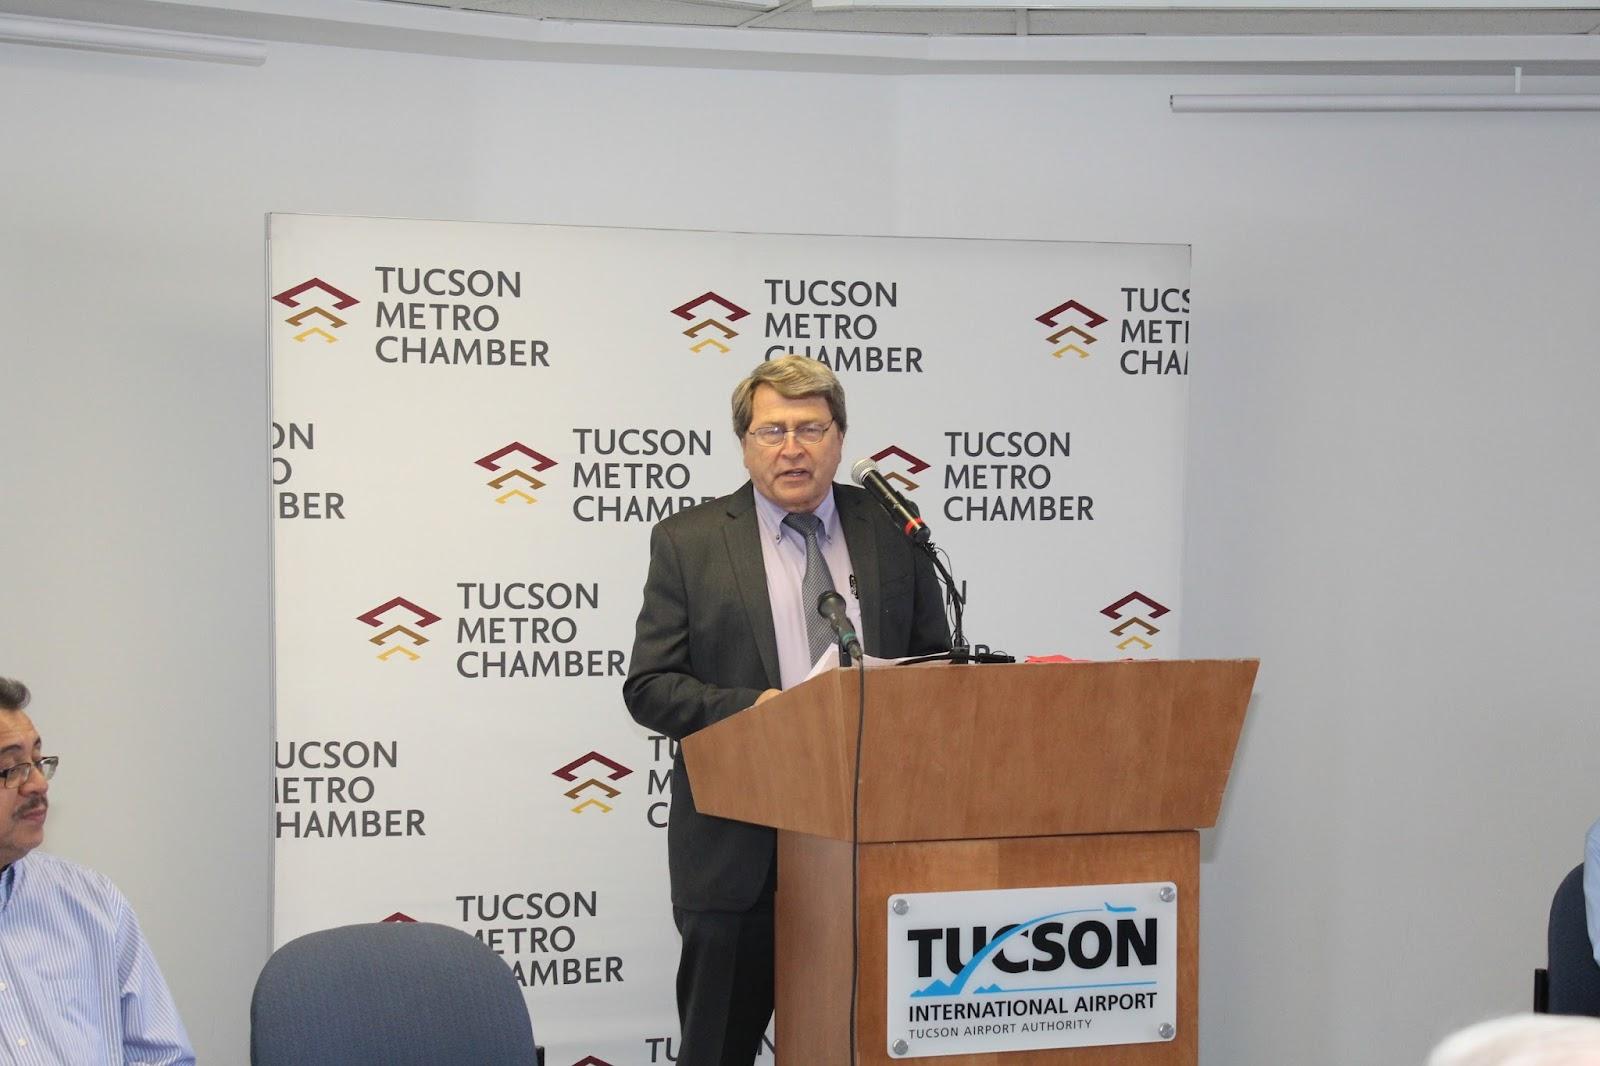 Tucson - JFK Non-Stop Route Announcement - IMG_3169.JPG